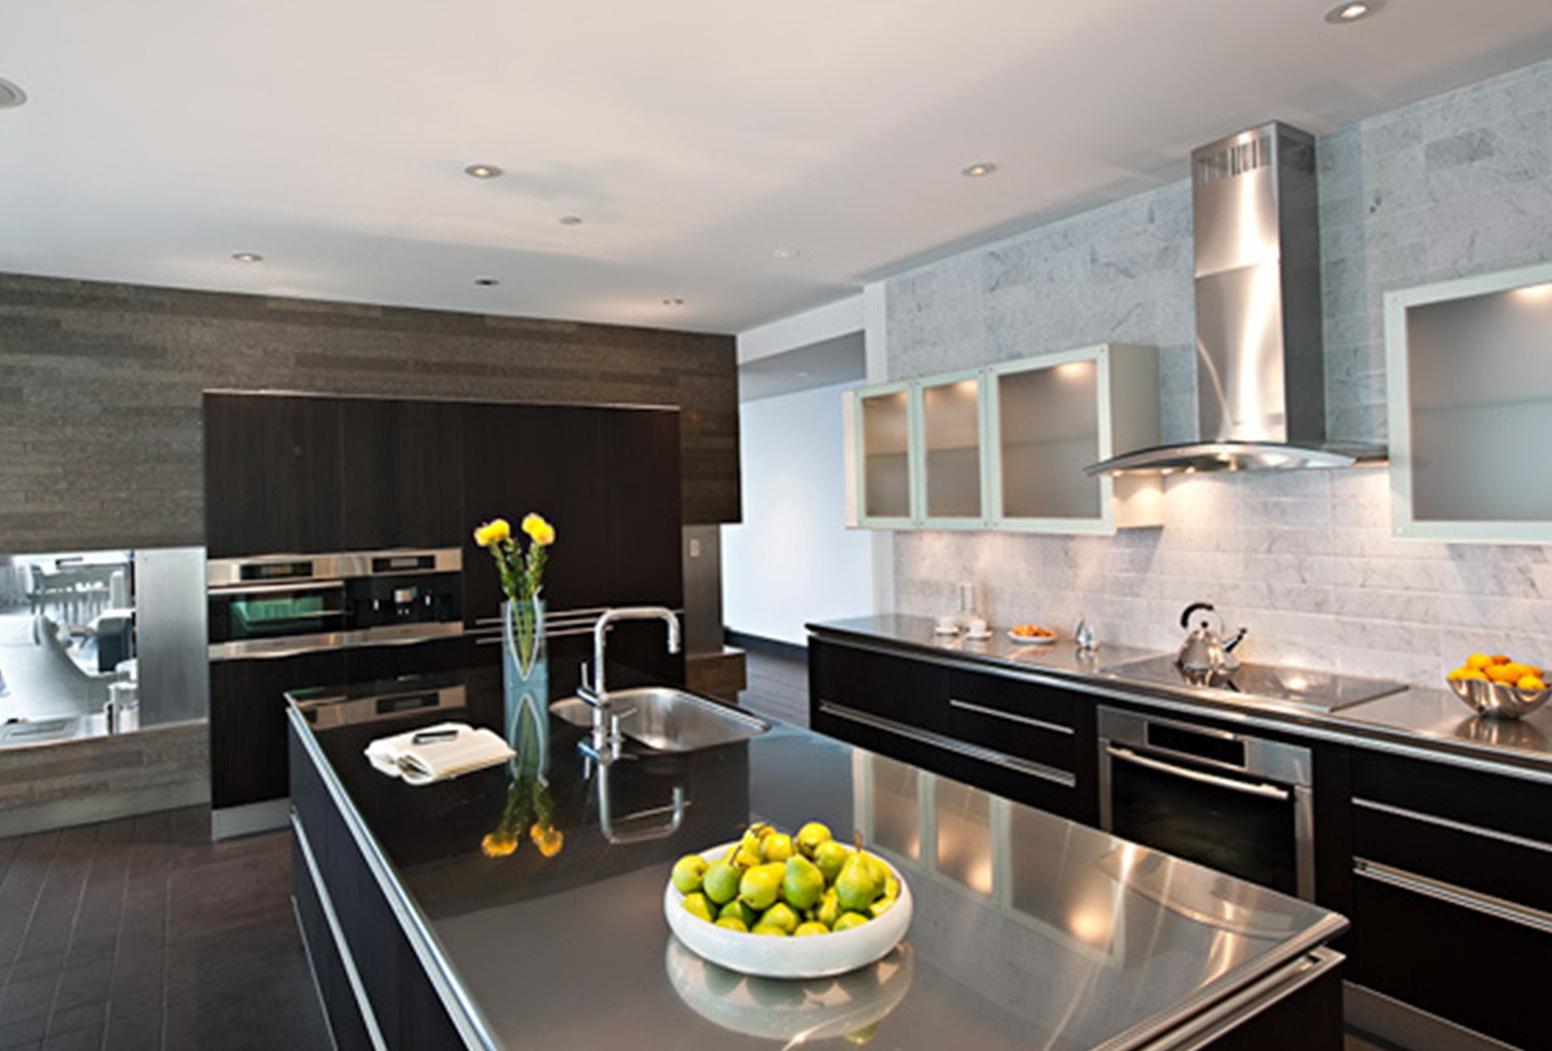 Kitchen Renovation Ideas 2014